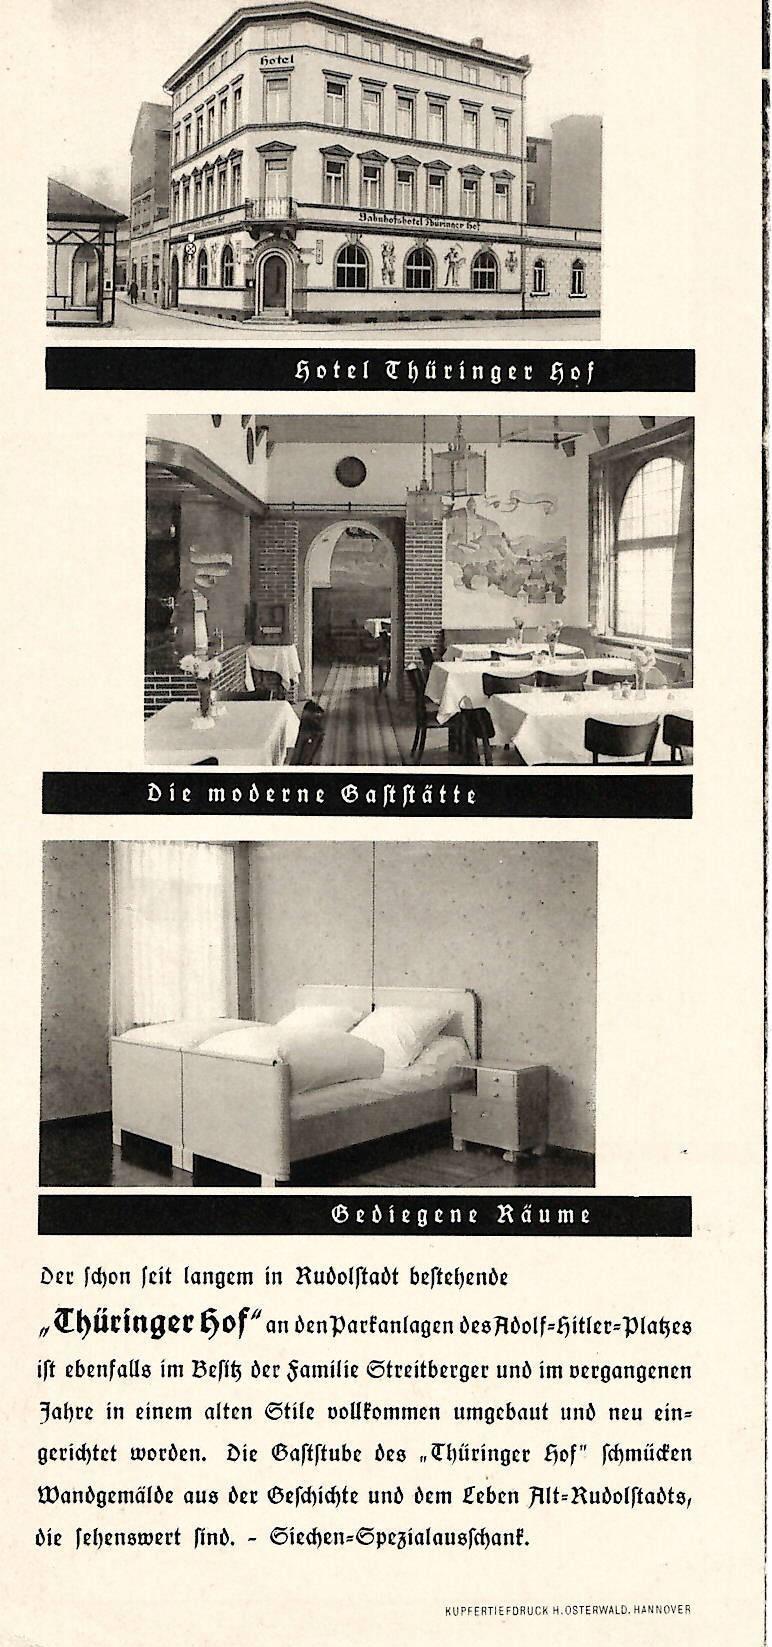 Chronik vom Hotel Thüringer Hof in Rudolstadt - Ein Prospekt vom Thüringer Hof Rudolstadt aus dem Jahr 1938